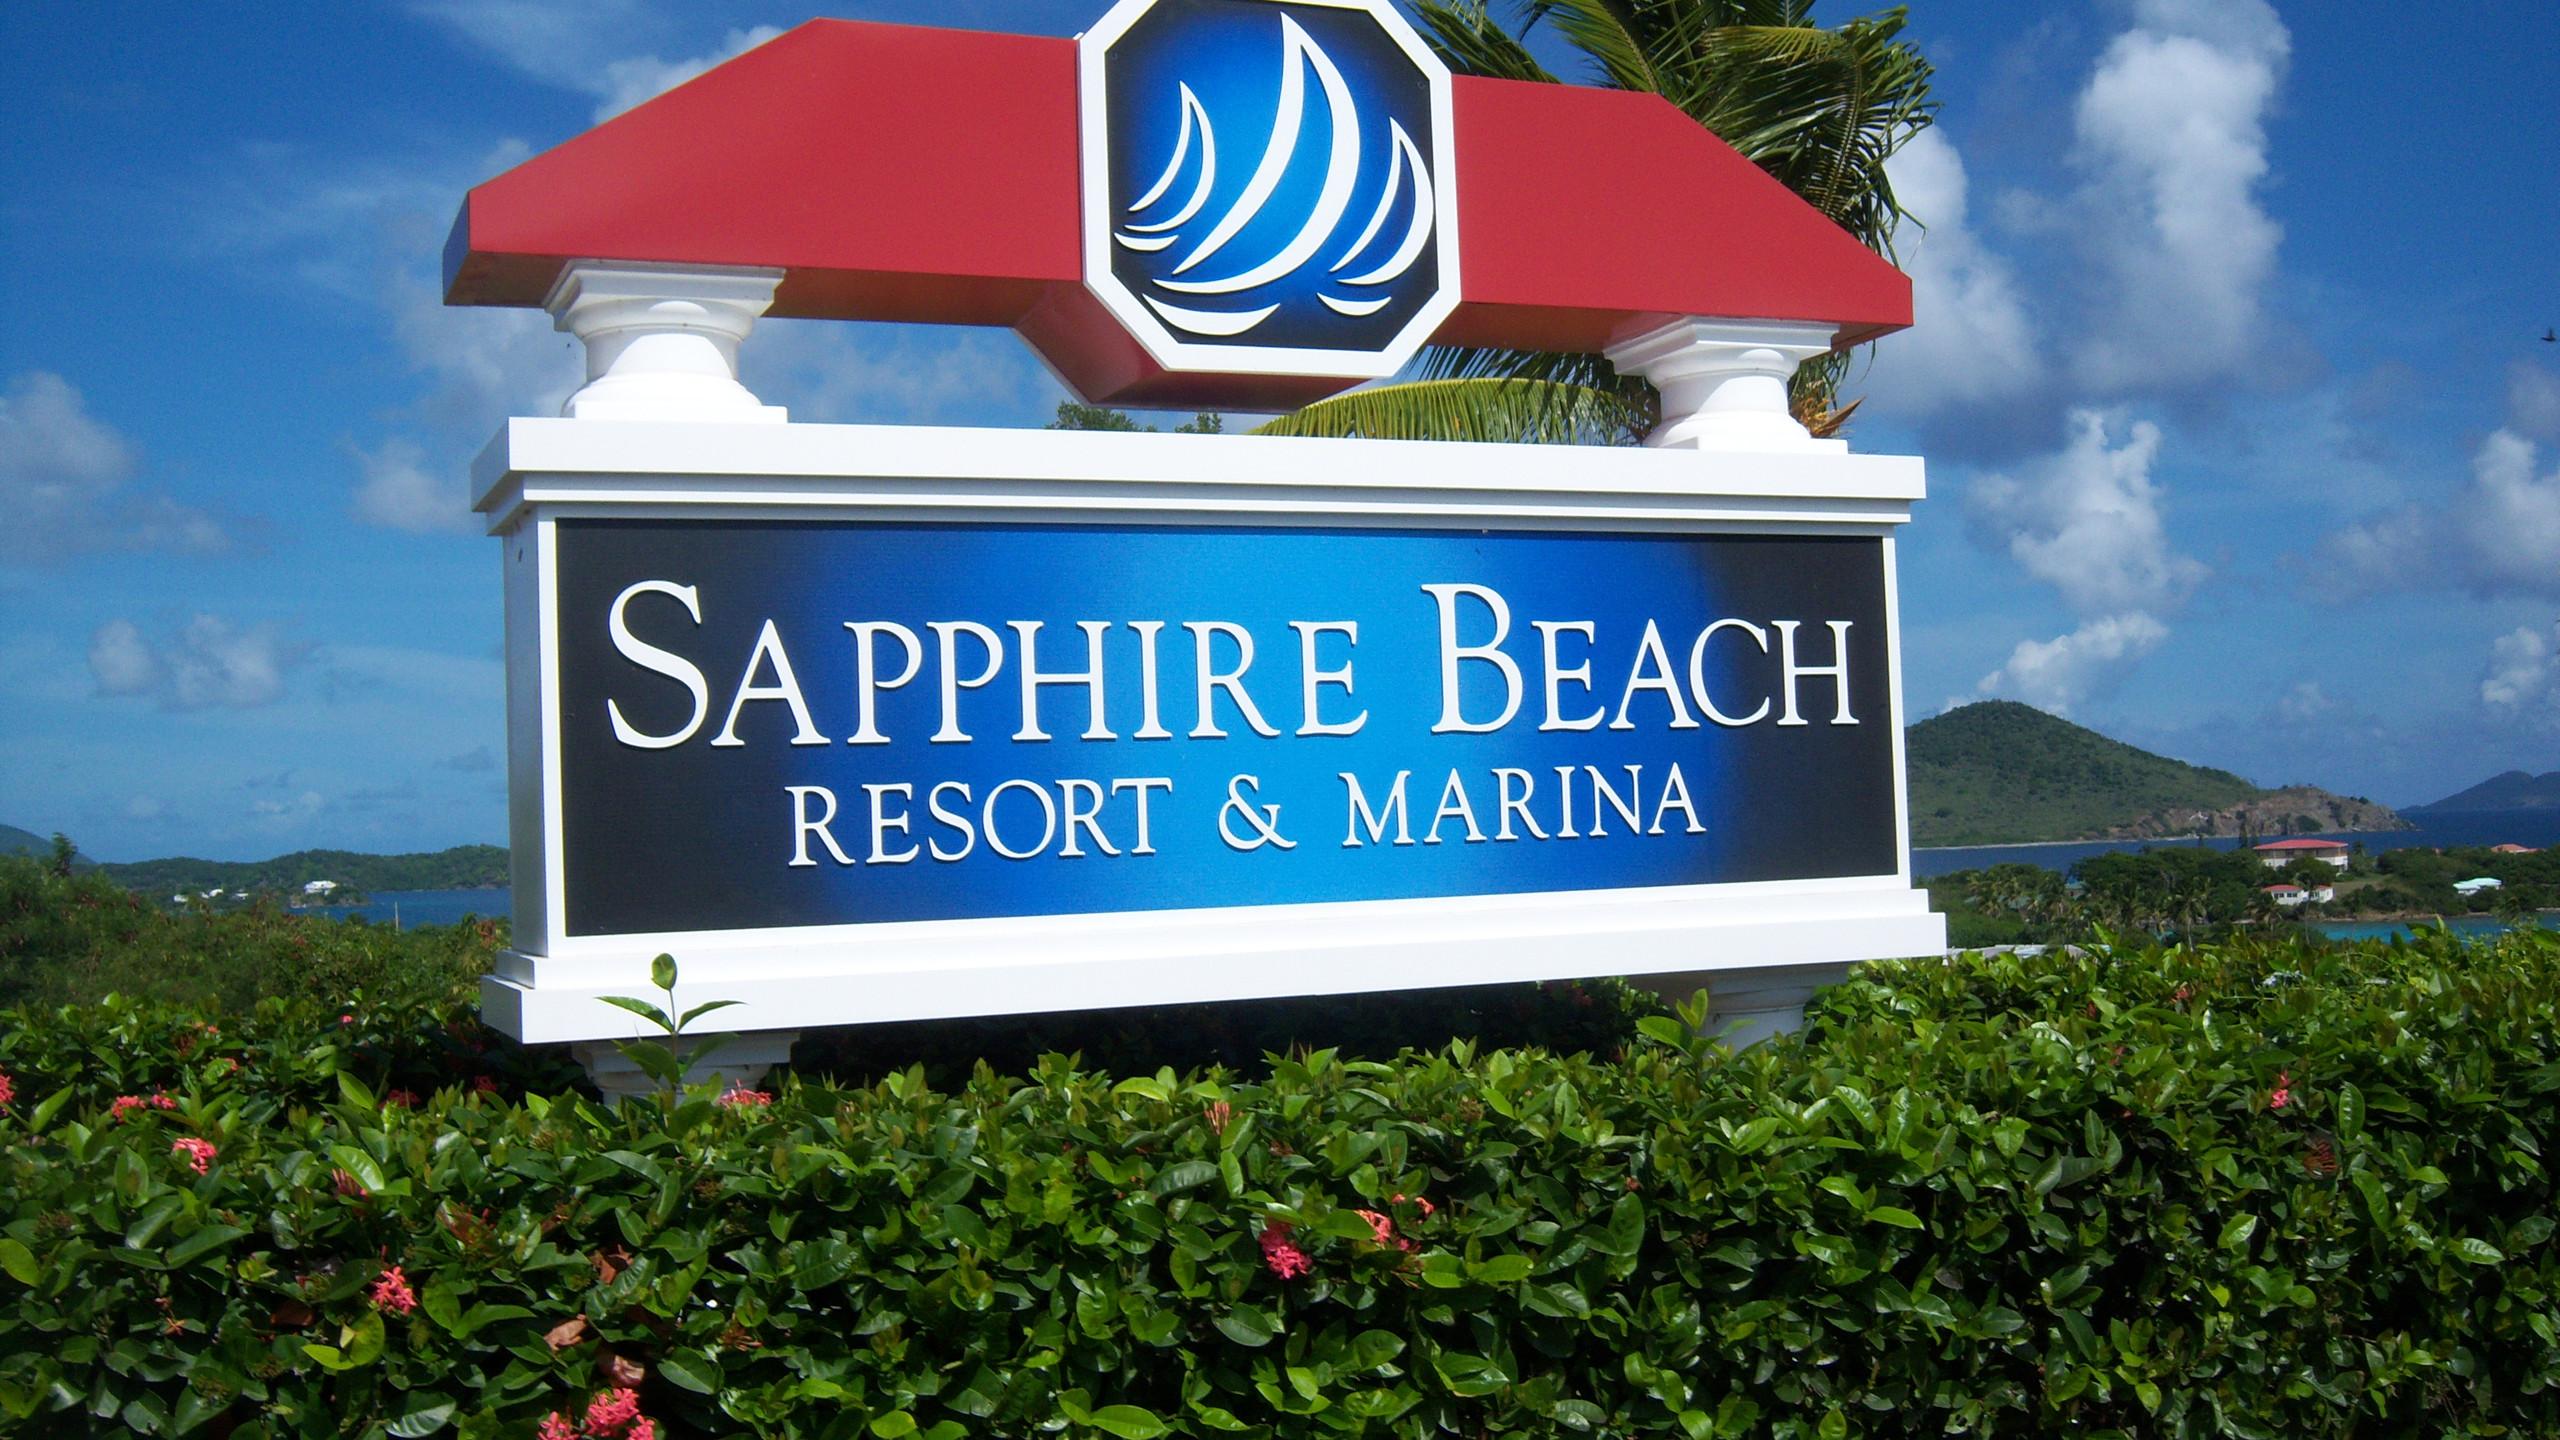 La entrada a Sapphire Beach  Resort